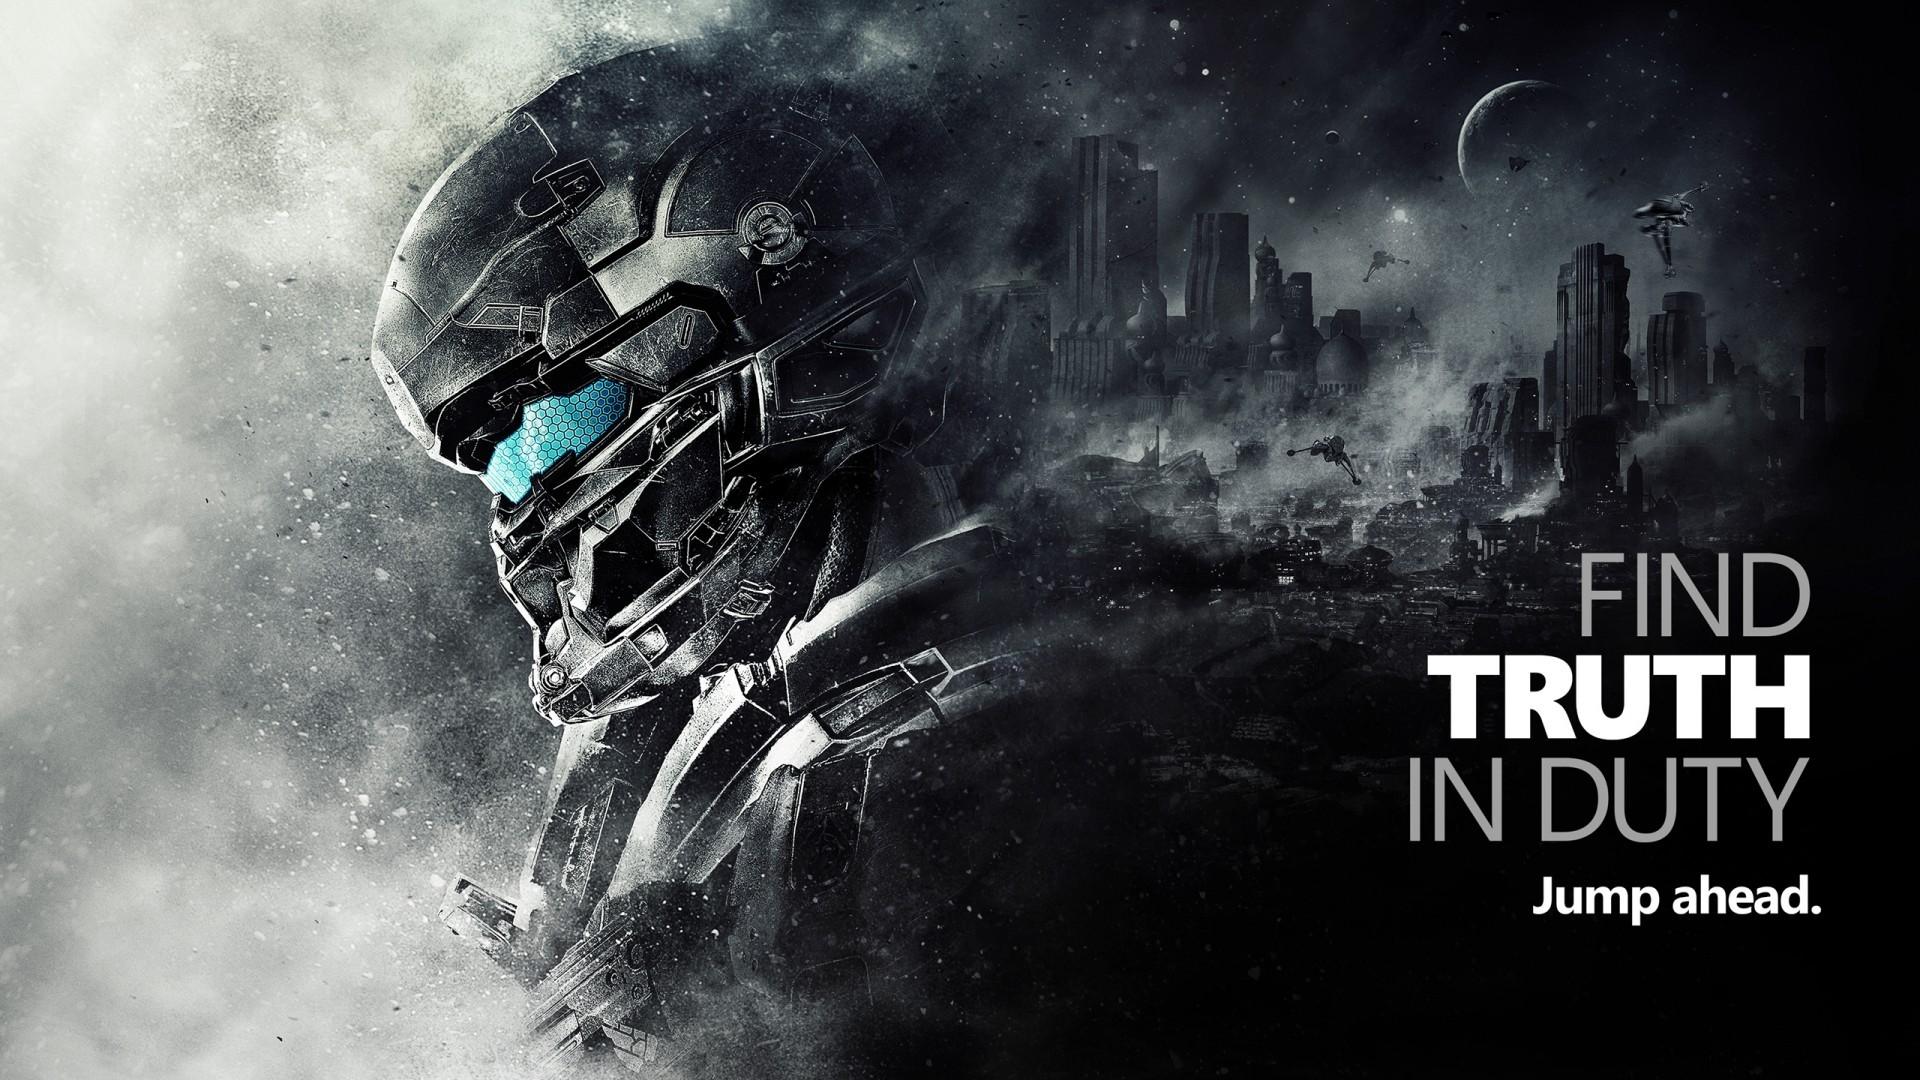 Amazing Wallpaper Logo Xbox One - Xbox-Halo-Halo-5-poster-Xbox-One-Microsoft-darkness-screenshot-computer-wallpaper-font-album-cover-126145  Gallery_731326.jpg